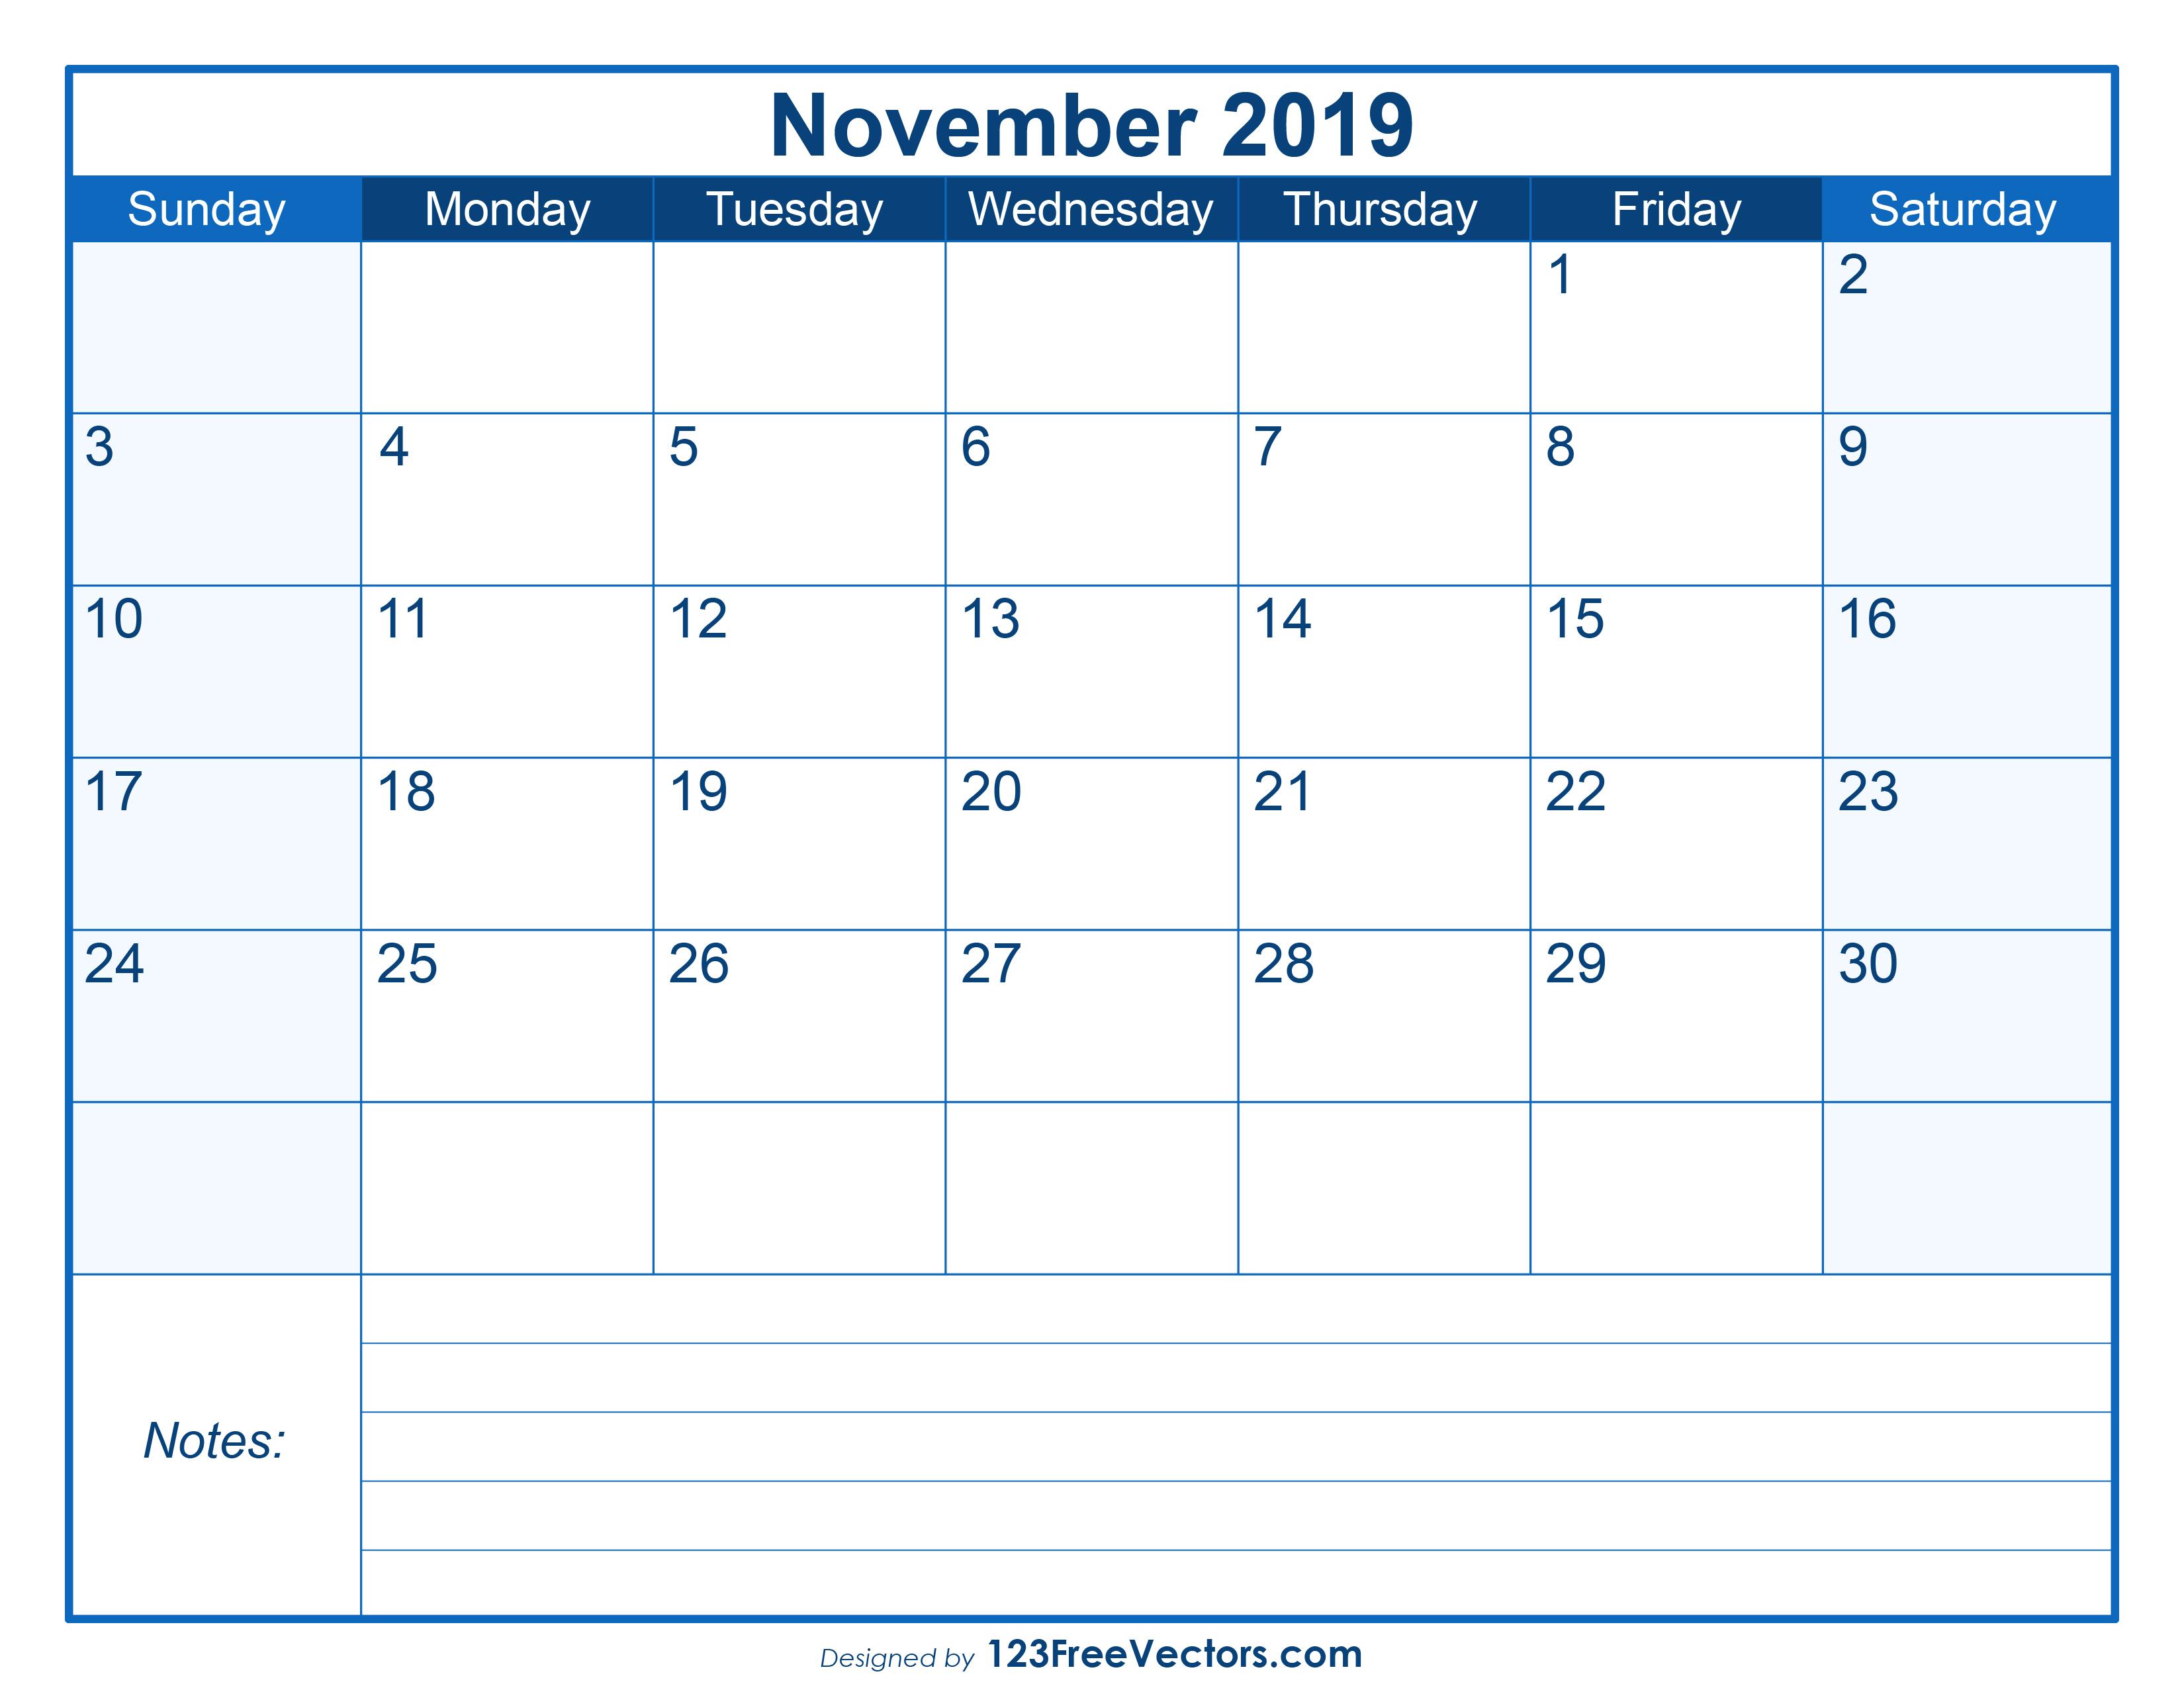 photo relating to Blank November Calendar Printable called Blank Printable November Calendar 2019